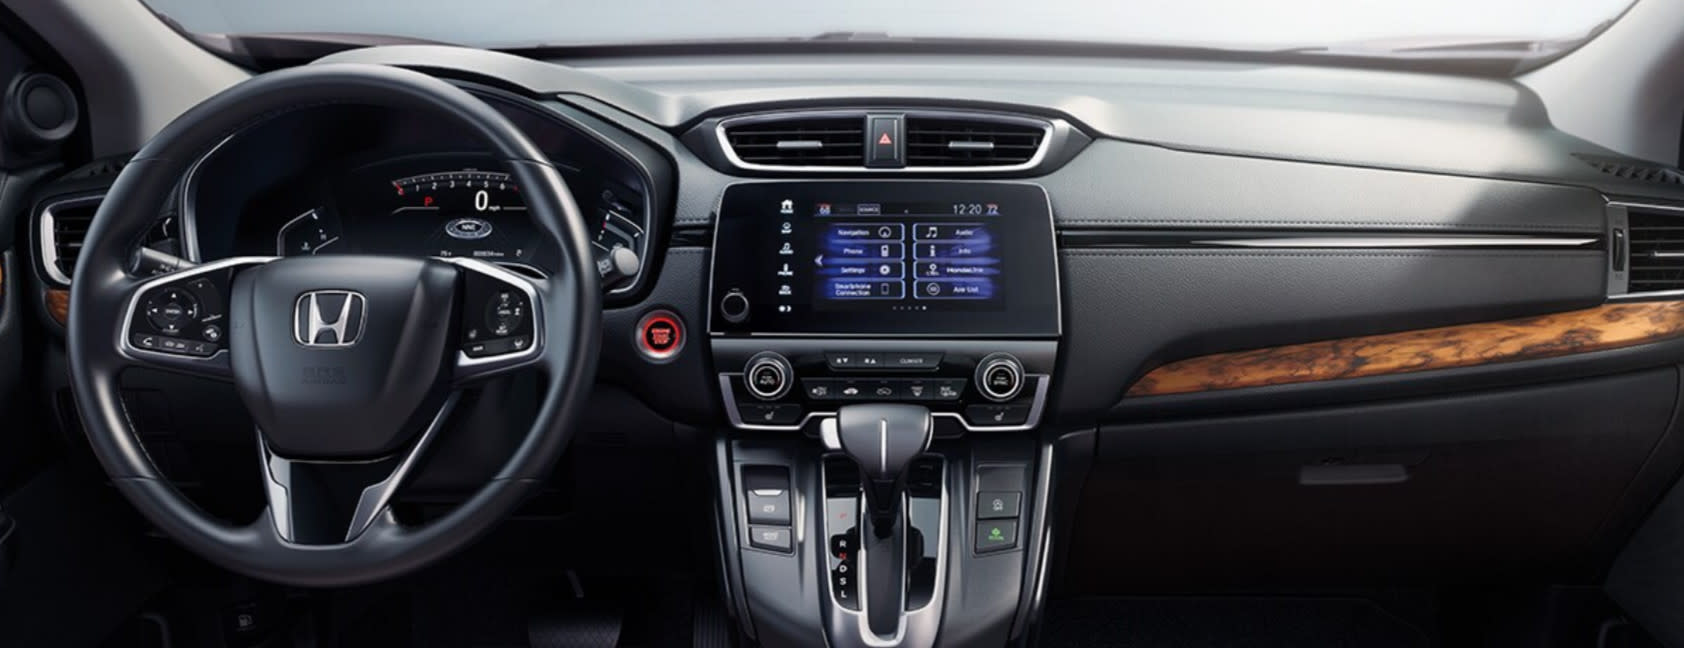 Interior of the 2020 Honda CR-V